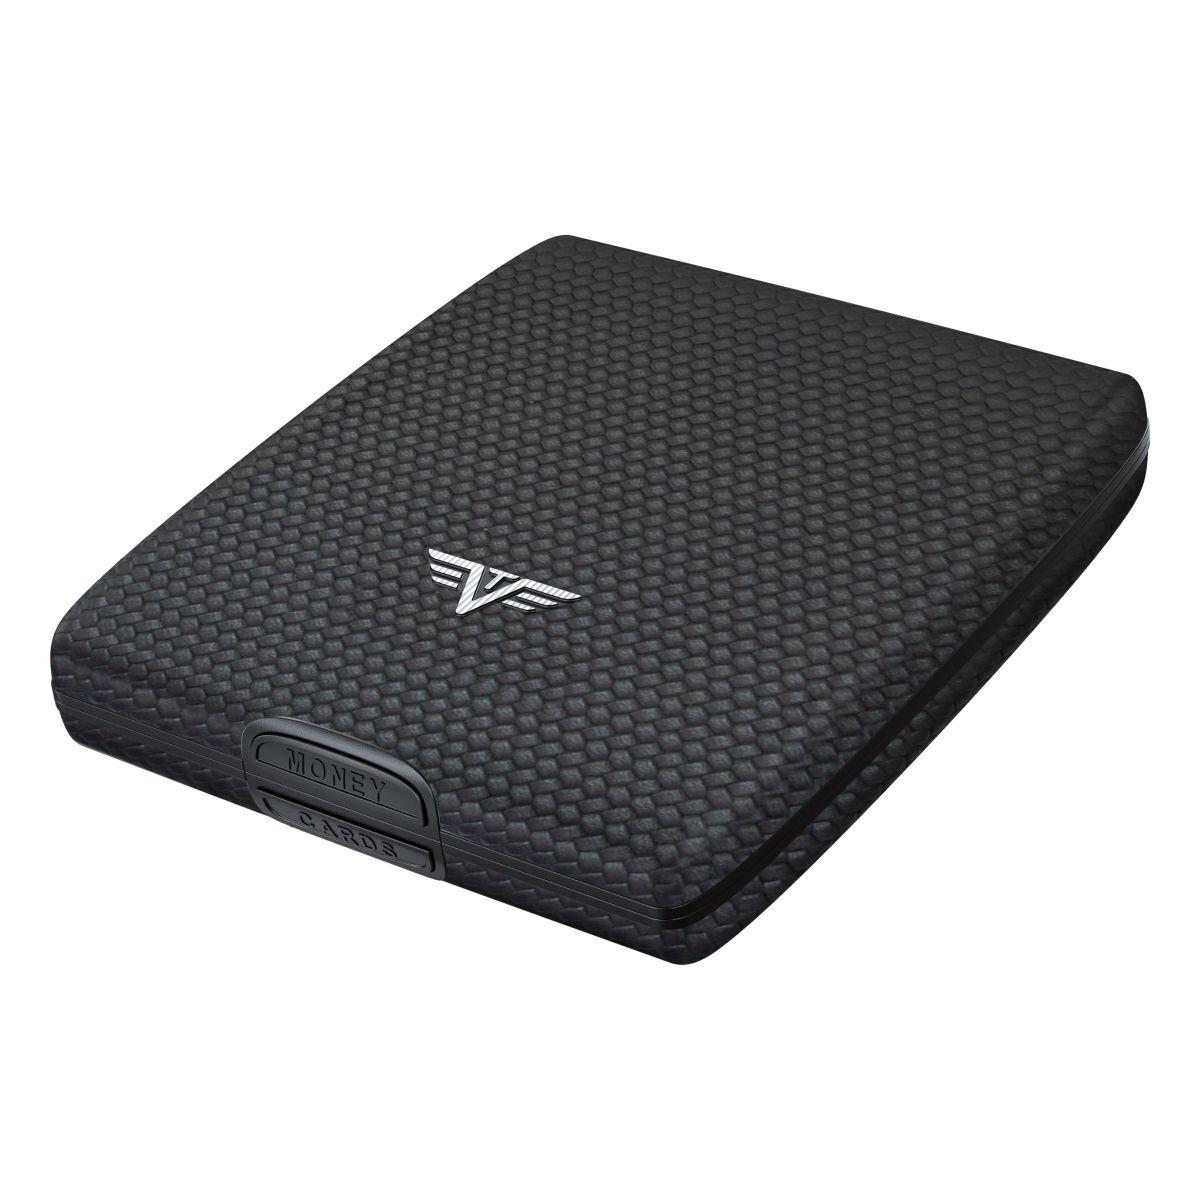 TRU VIRTU Aluminum Wallet Beluga - Money & Cards - Leather Line - Carbon Black